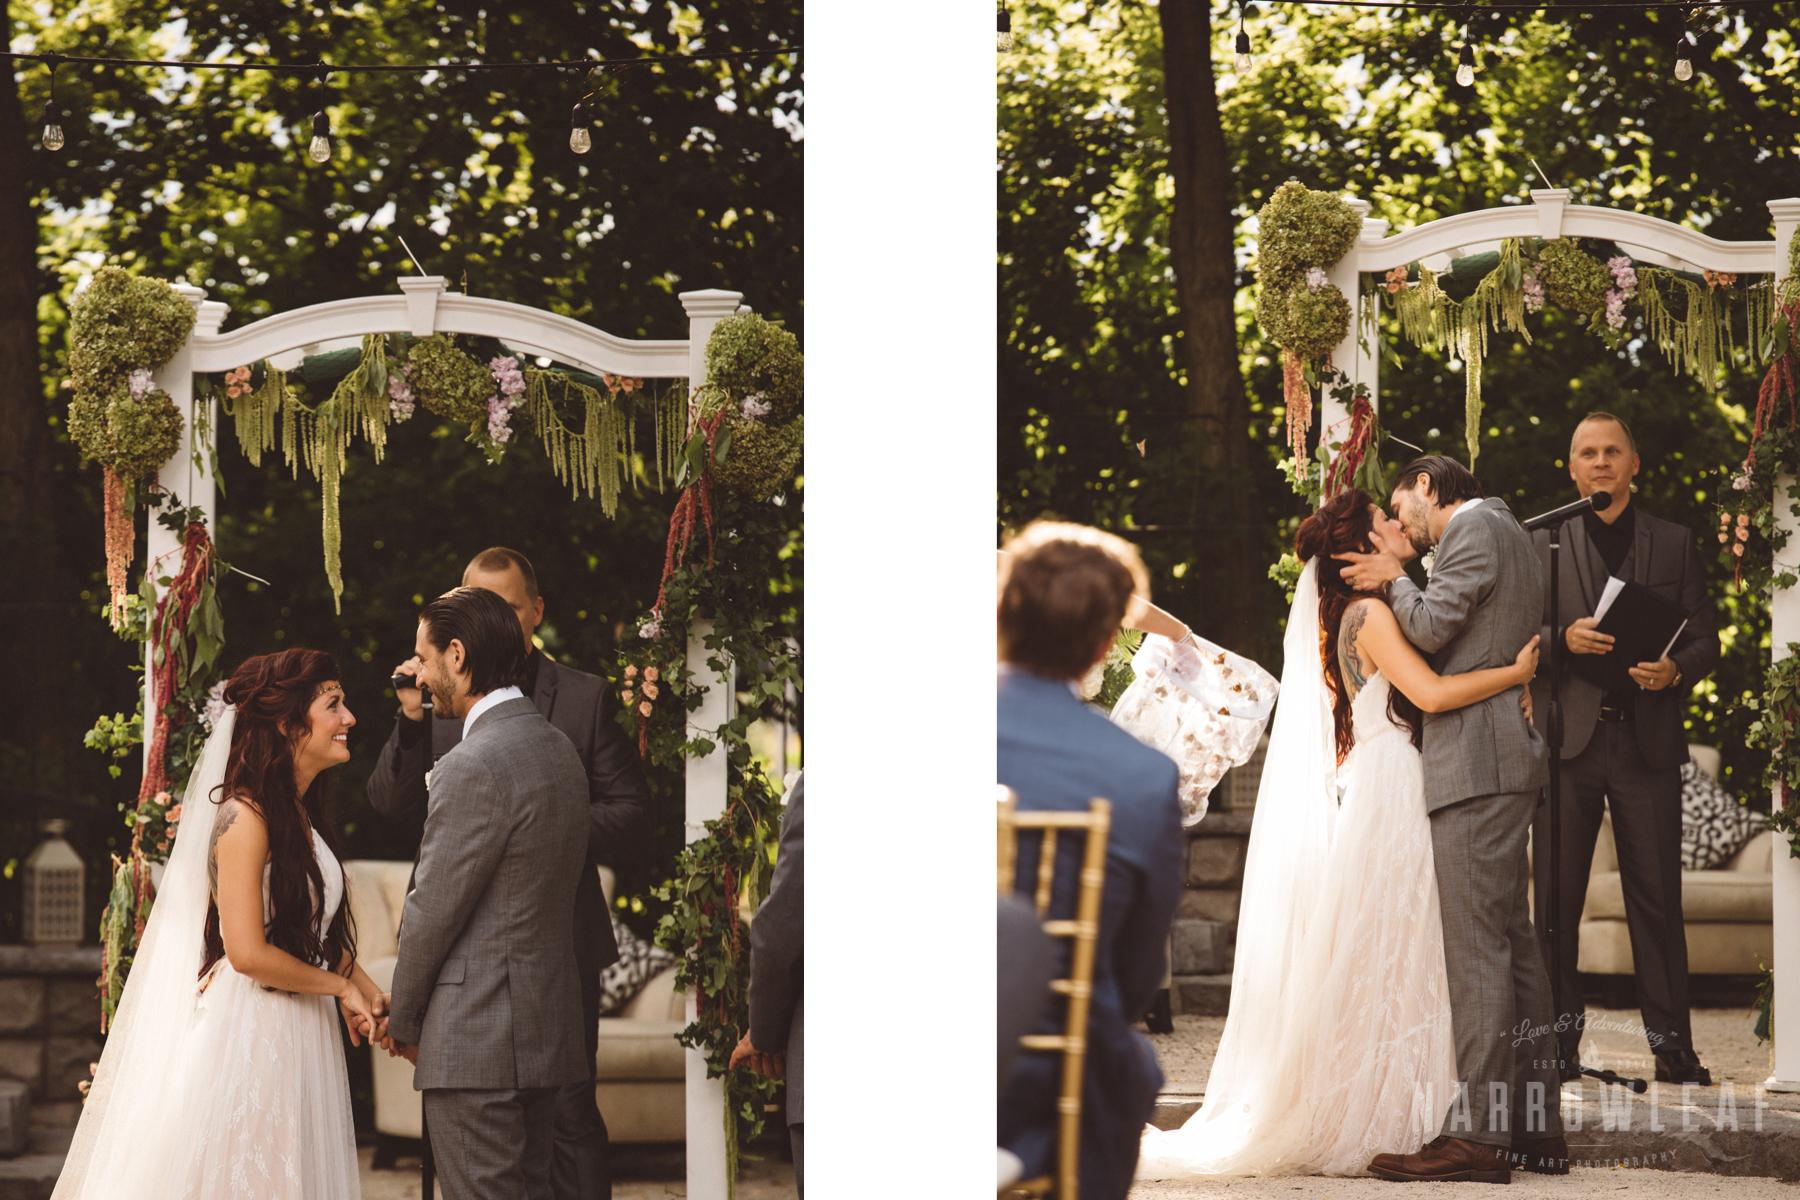 lake-geneva-wi-Wedding-ceremony-kiss.jpg